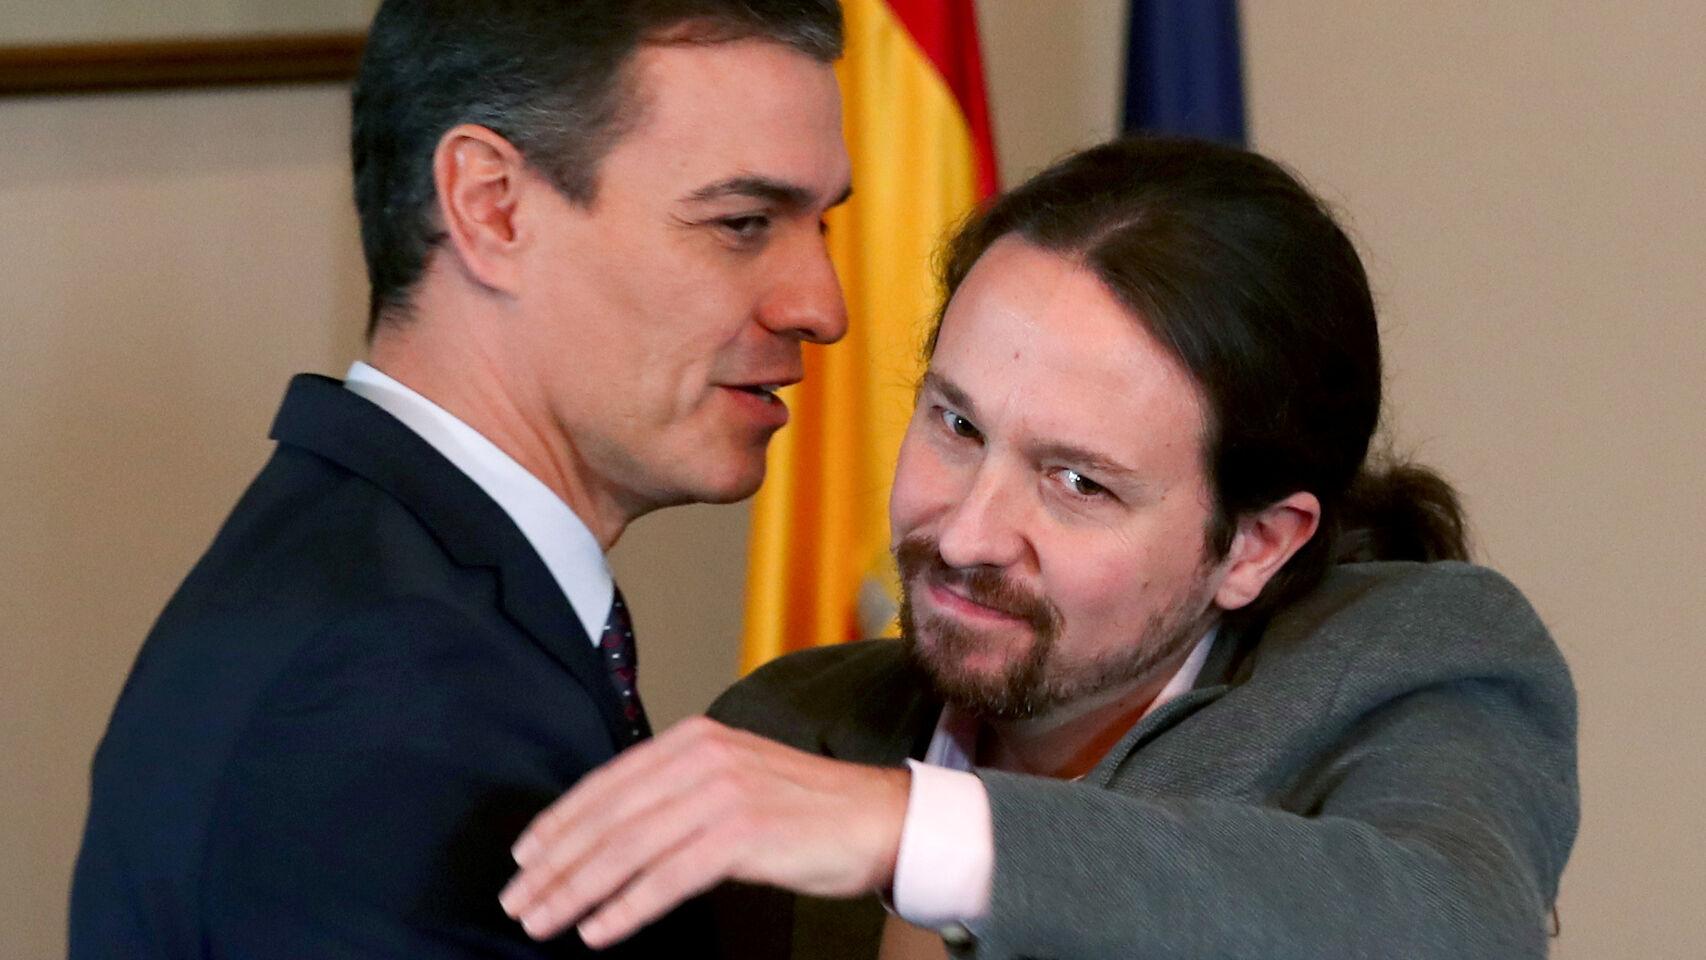 Bochorno mundial: Mohamed VI humilla a Pablo Iglesias y denigra a Pedro Sánchez